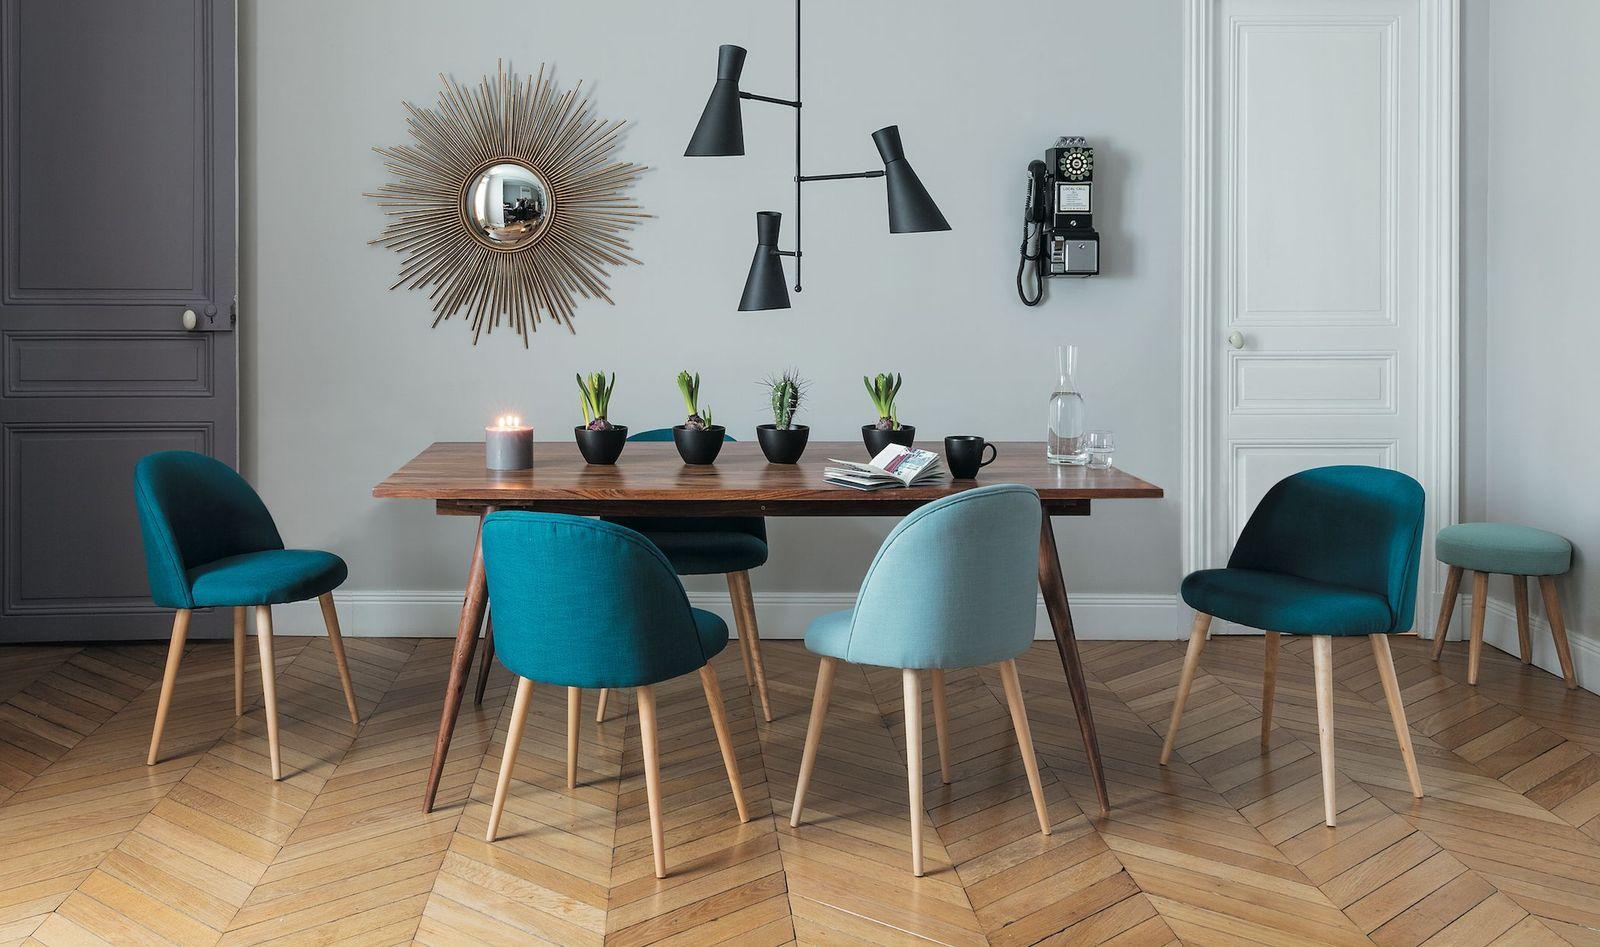 Decoraci n la casa azul ideas decorativas para dar a tu for Ideas decorativas hogar